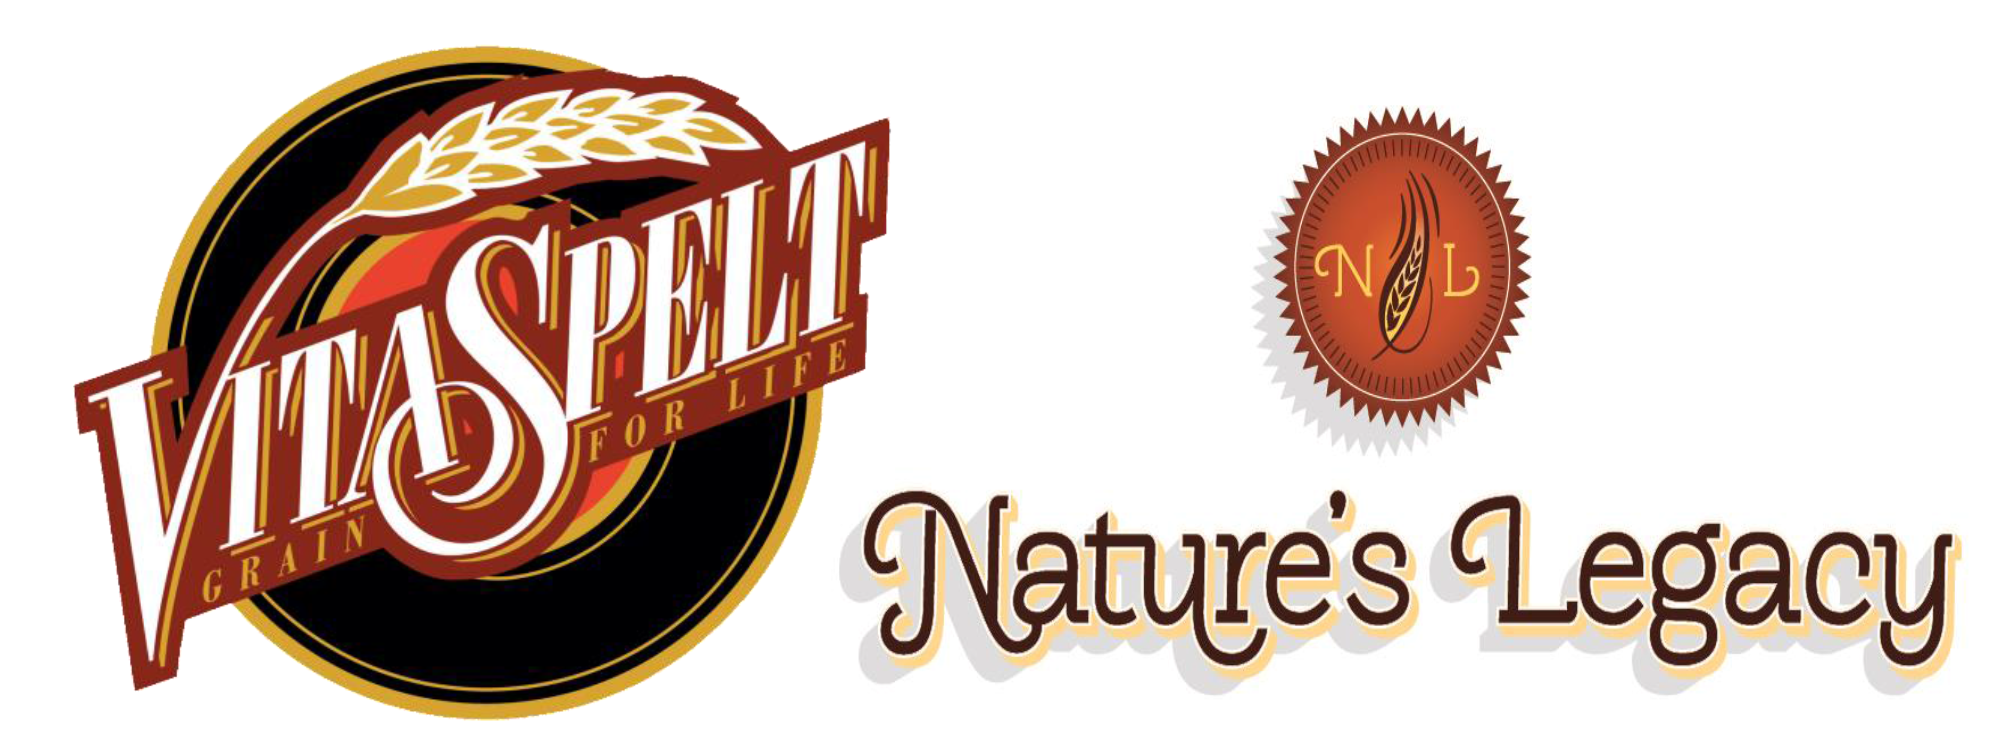 Purity Foods, Inc.